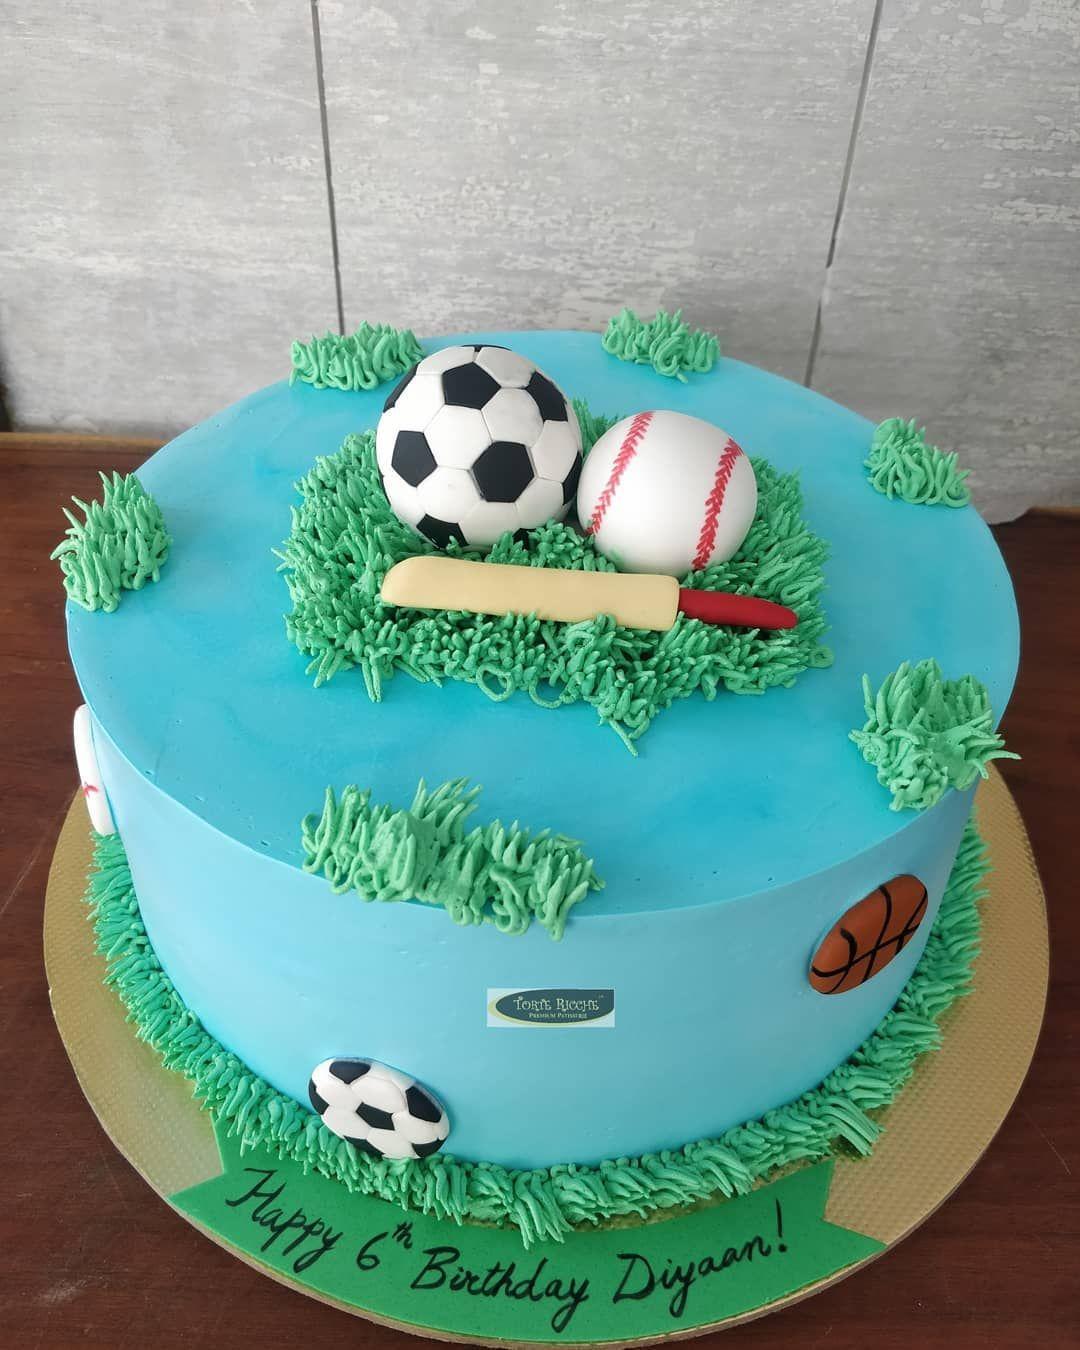 Chocolate cake.. Sports themed cake for Diyaan's  6th birthday.. #instafood #instacakes #foodporn #premiumcake #customisedcakes  #tortericche #foodstagram #foodgasm #trelltalebangalore #positivevibes #cheflife #whippedcreamc